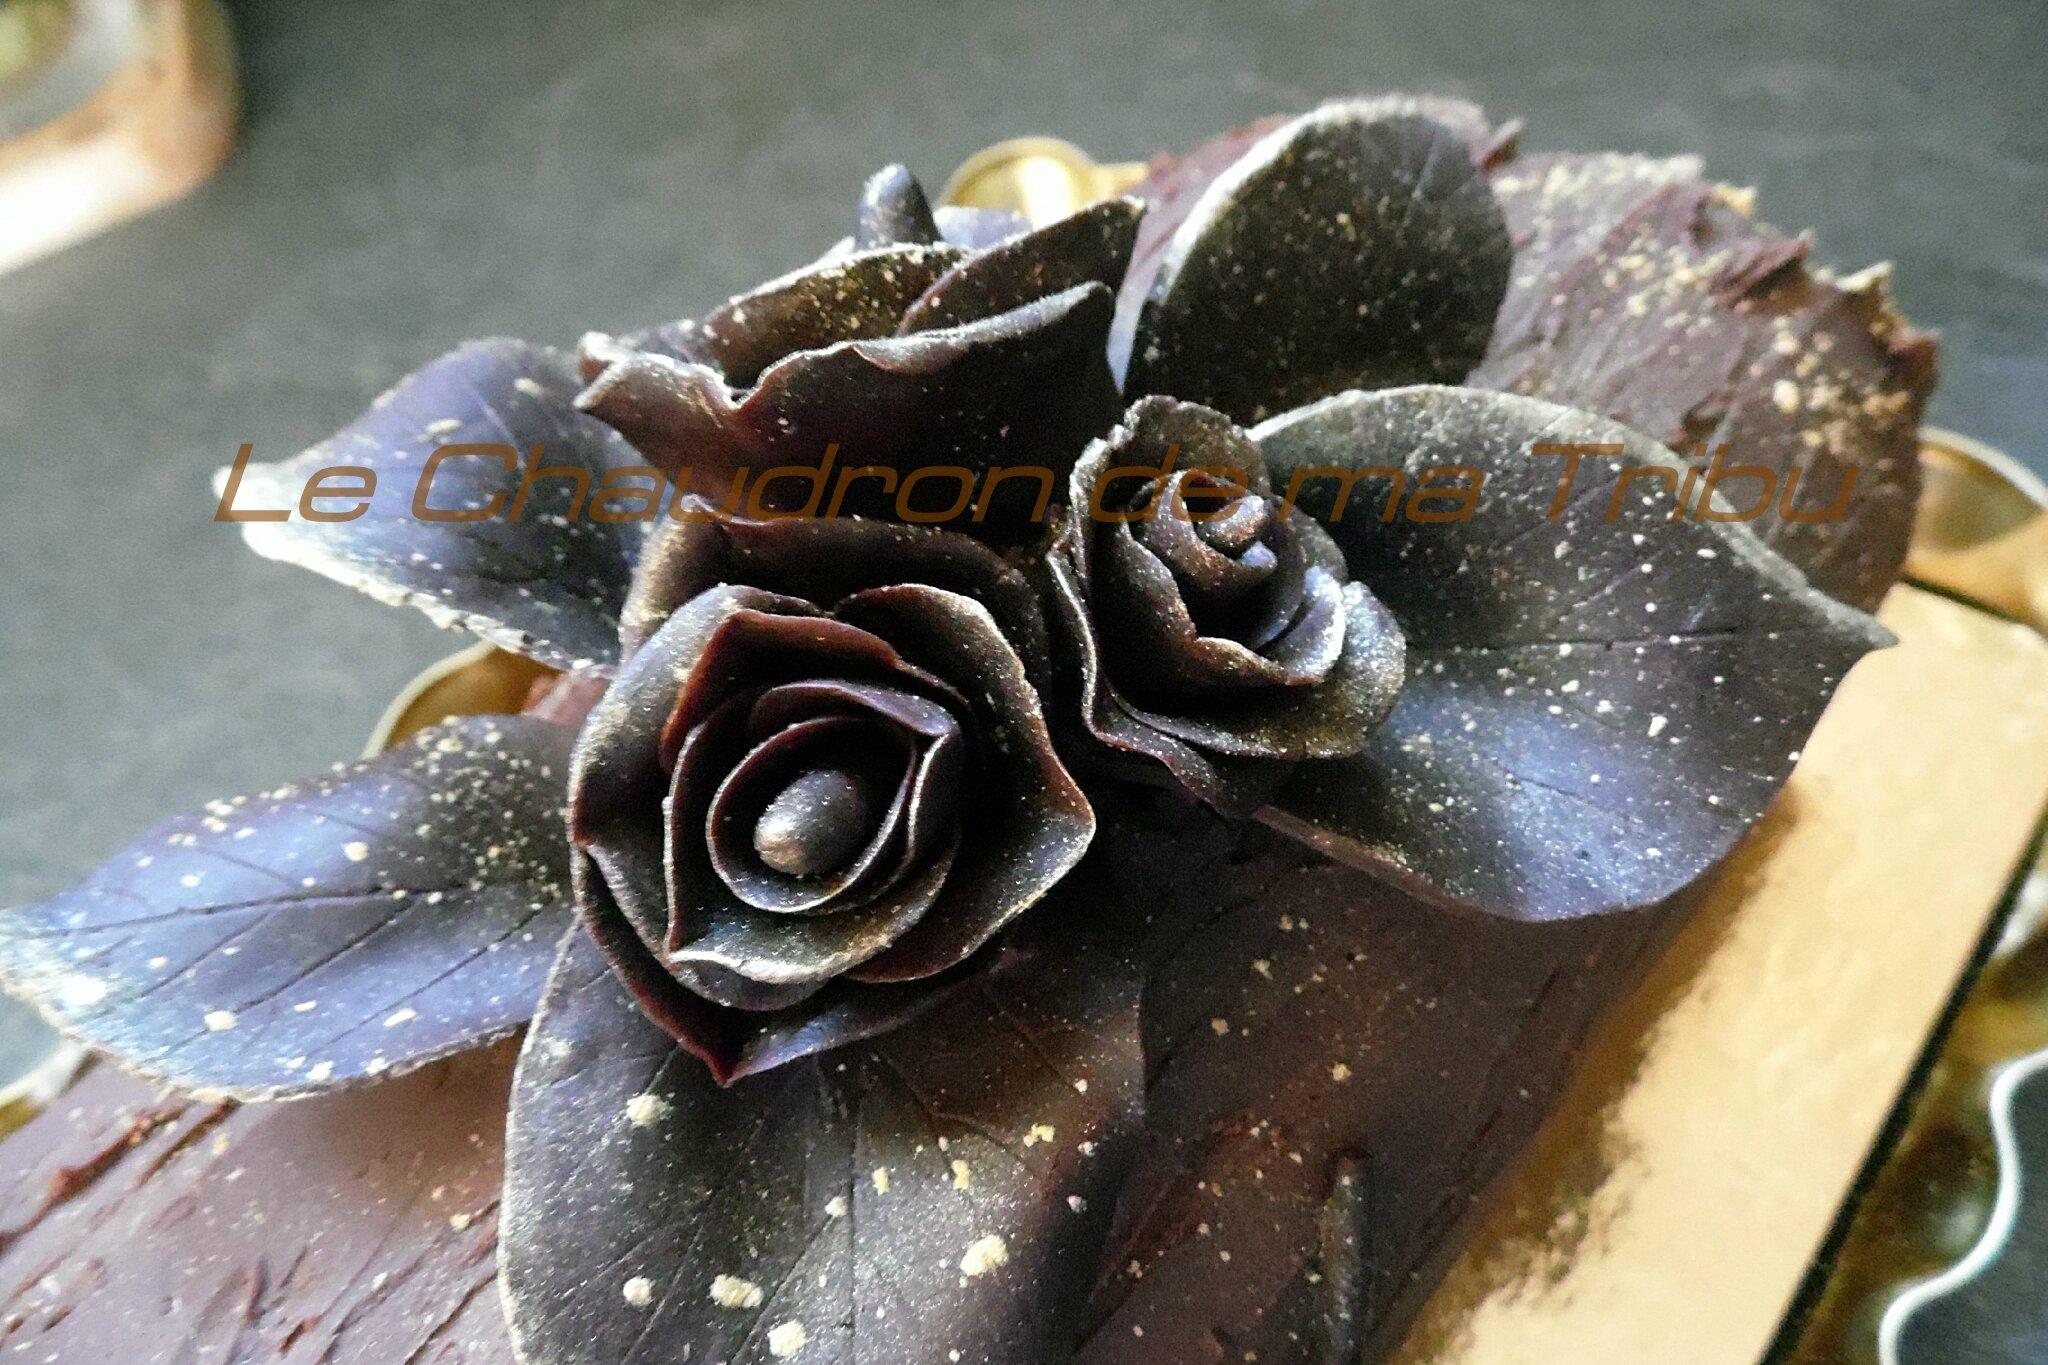 D coration en chocolat noel for Decoration en chocolat